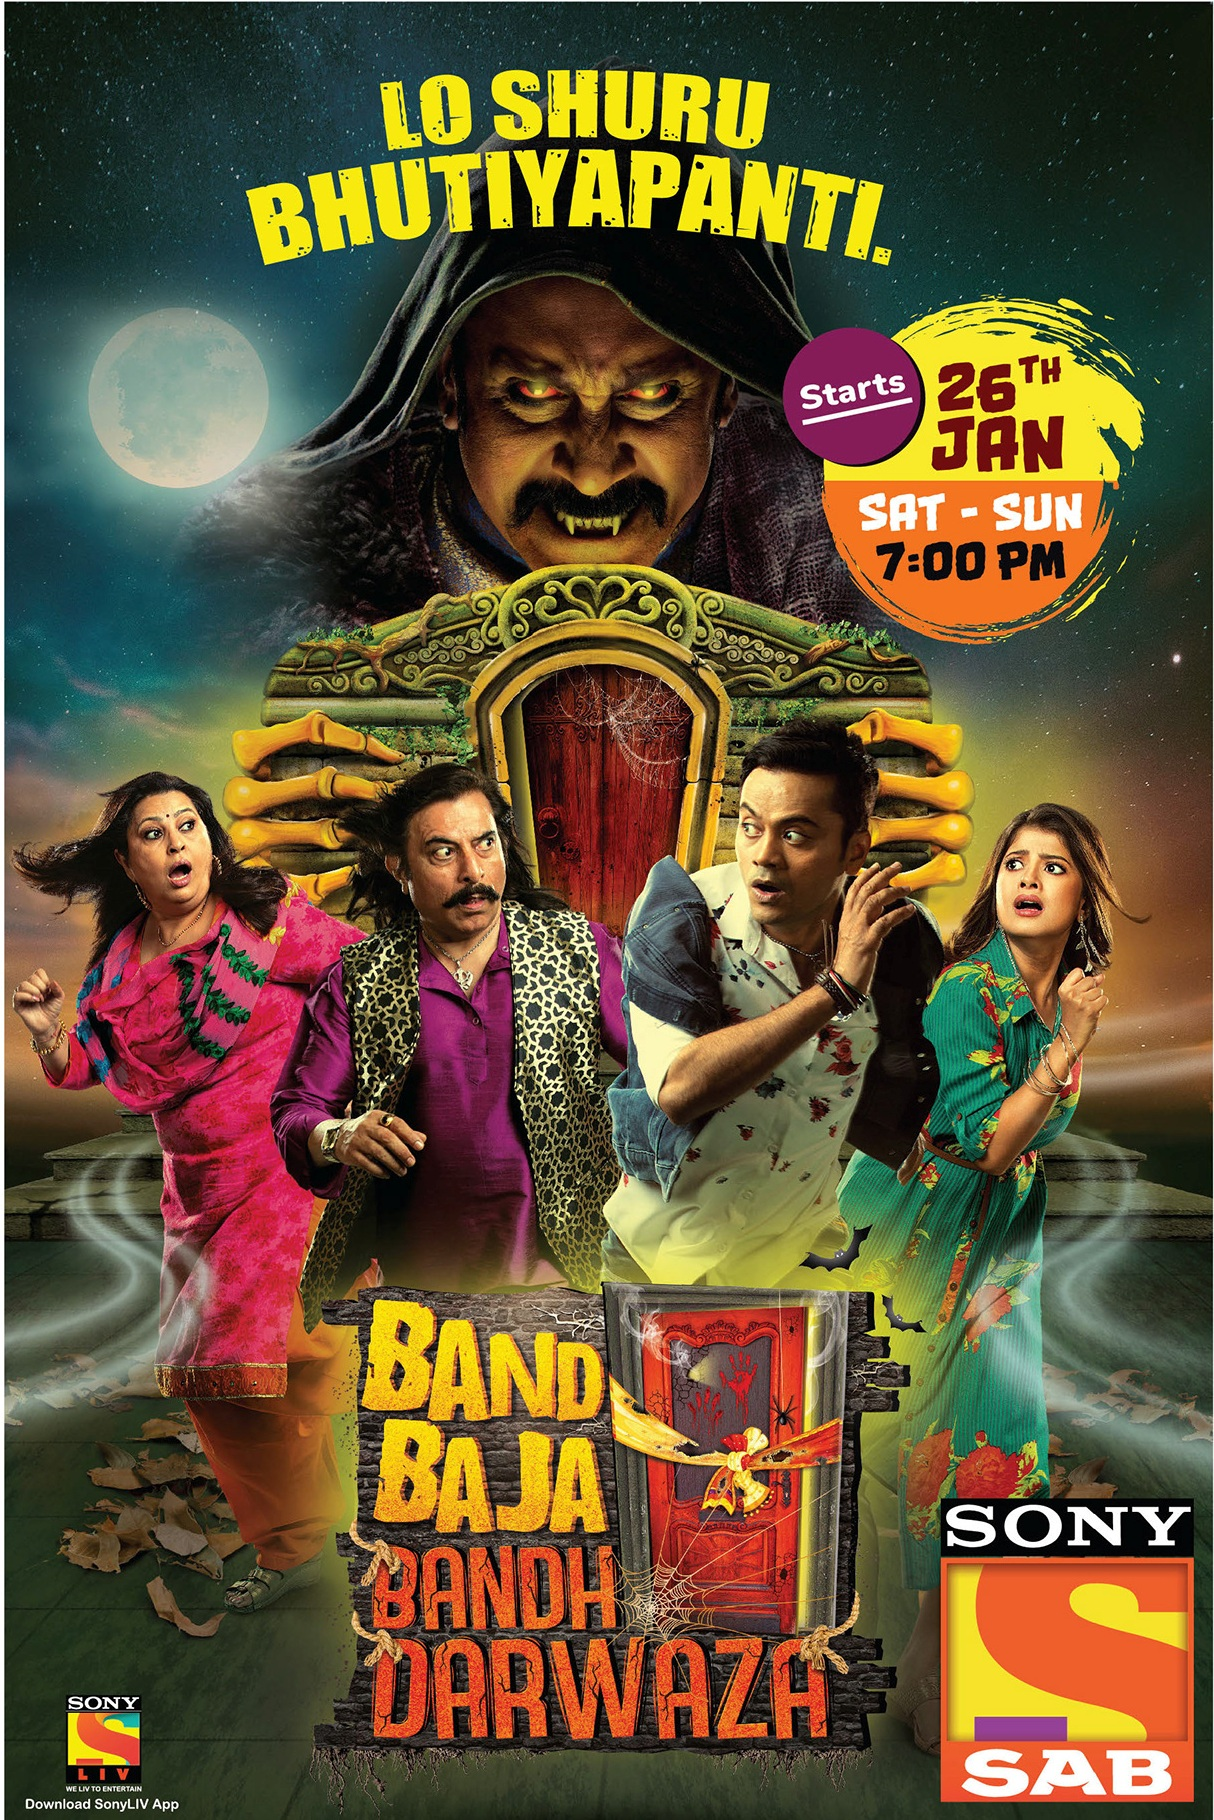 Band Baja Bandh Darwaza (TV Series 2019– ) - IMDb